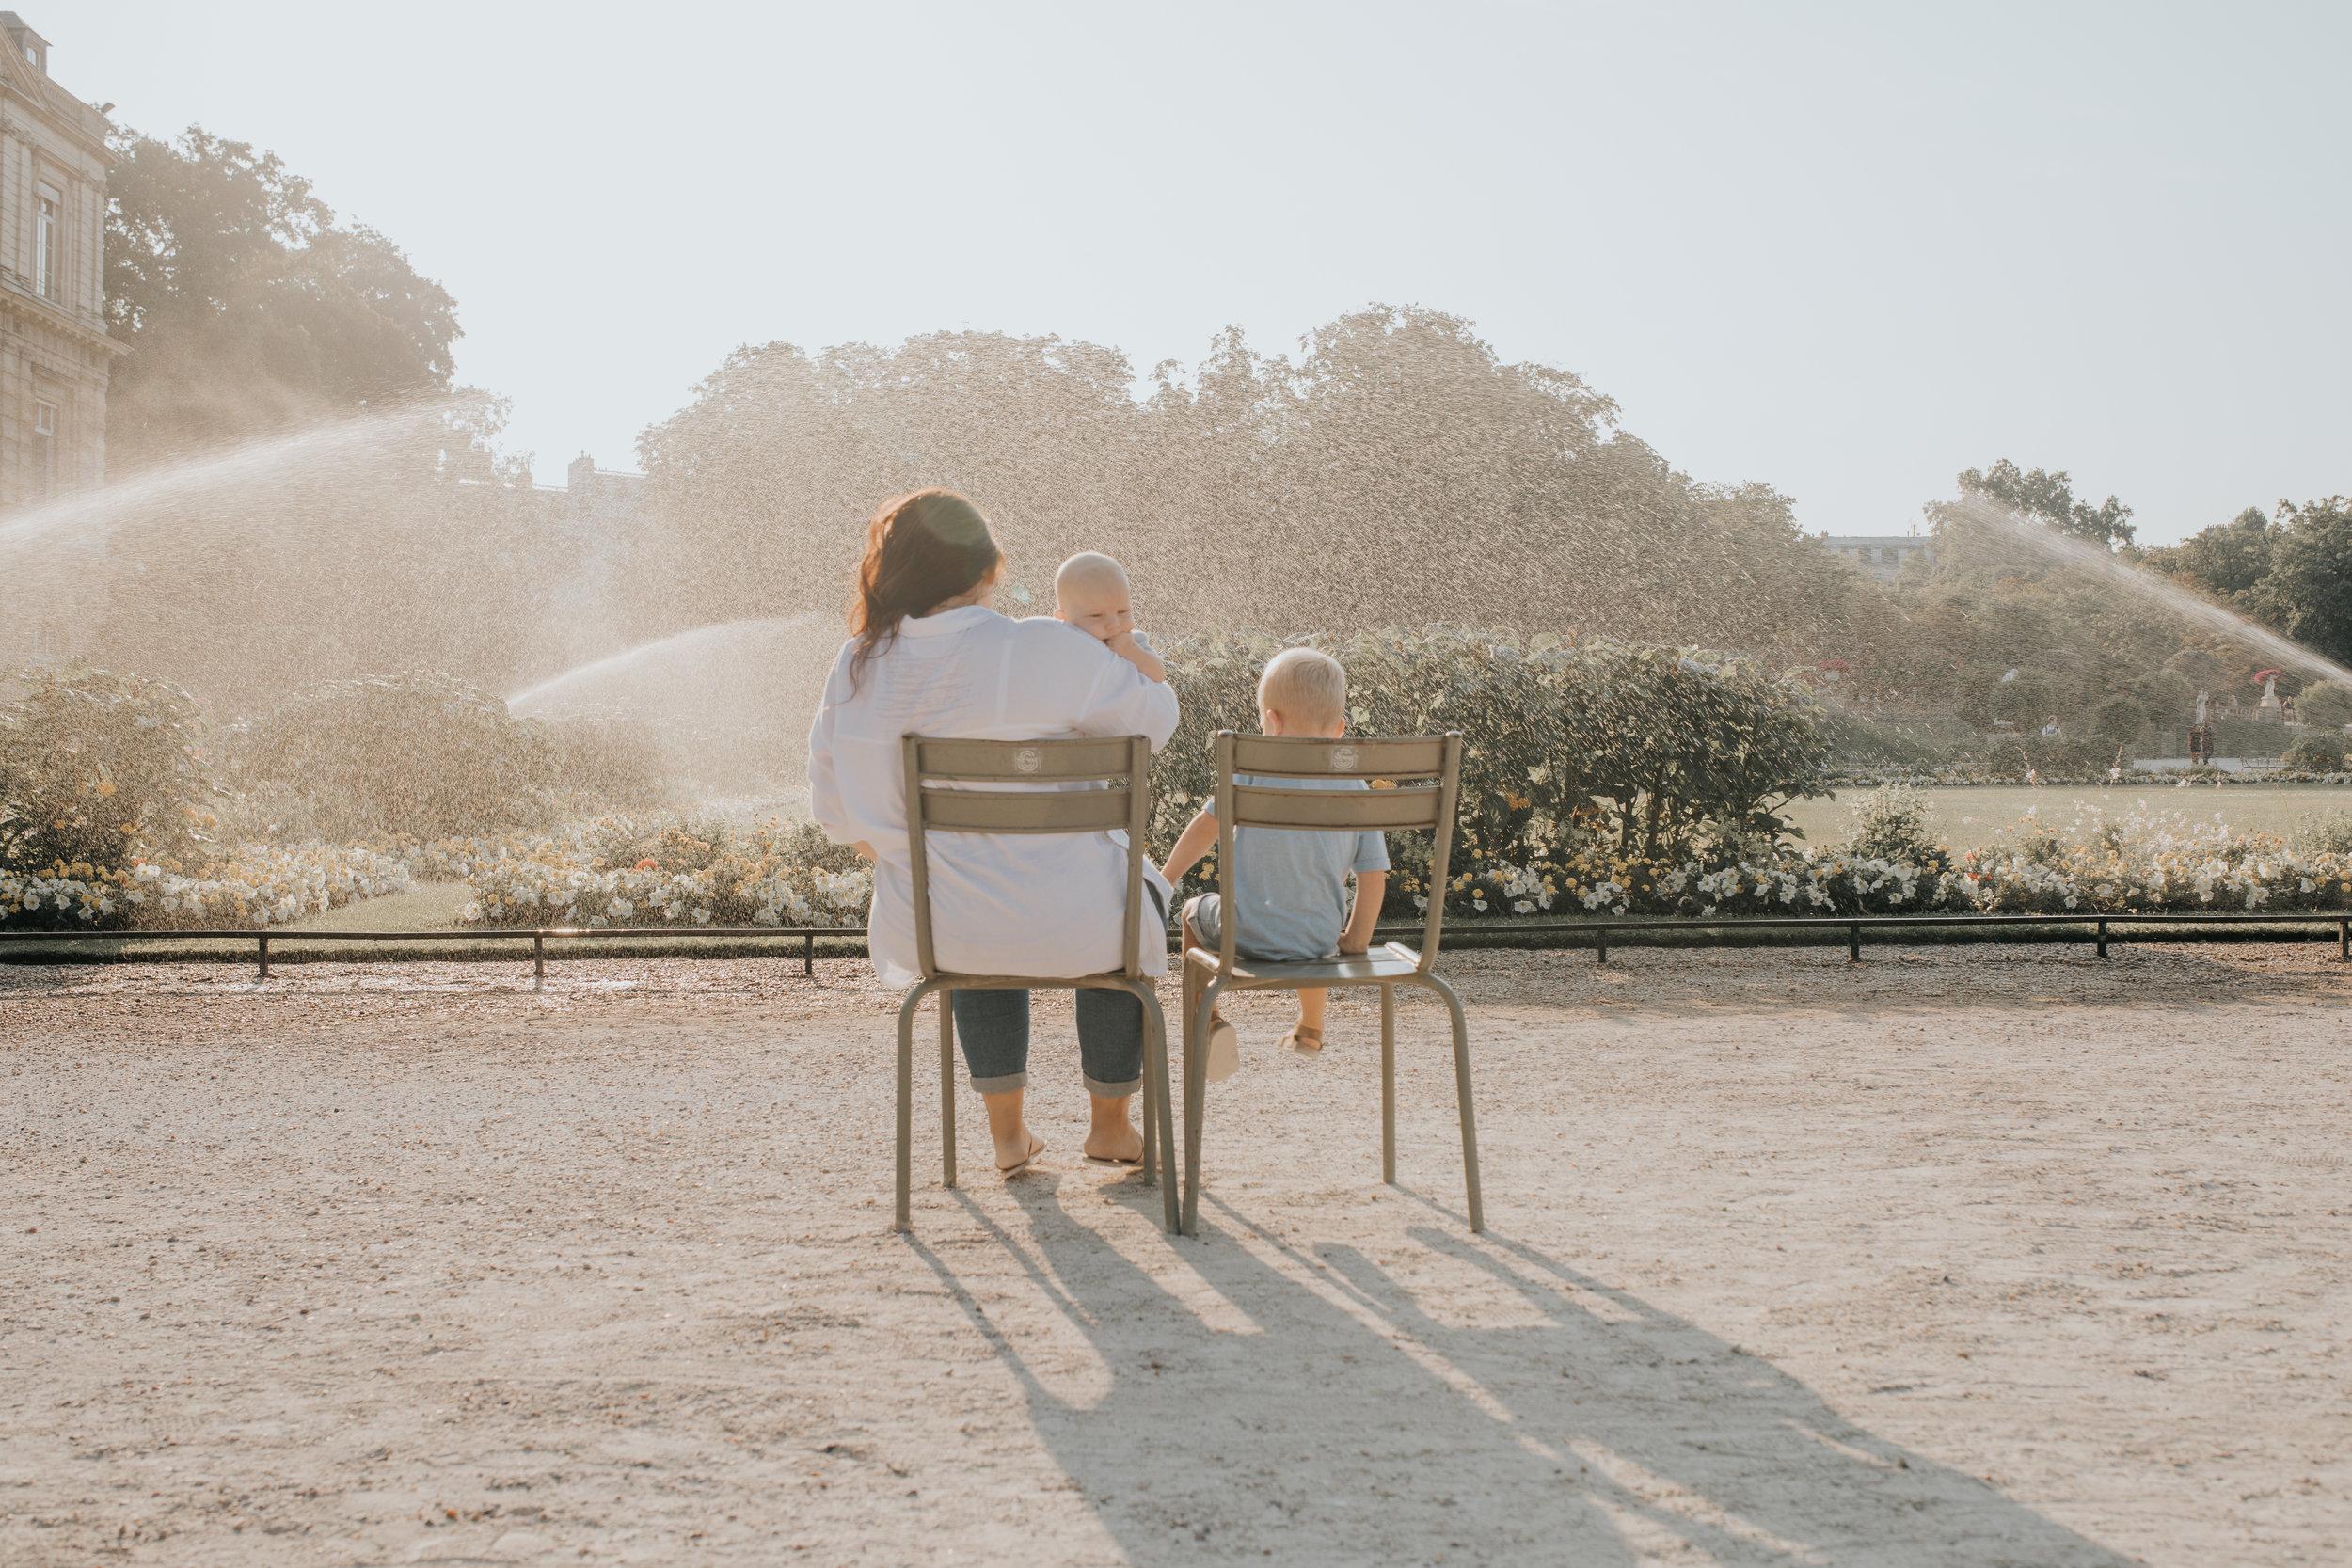 Amy-Noah-Theo-kelechianna-jardins-luxembourg-paris-family-21.jpg